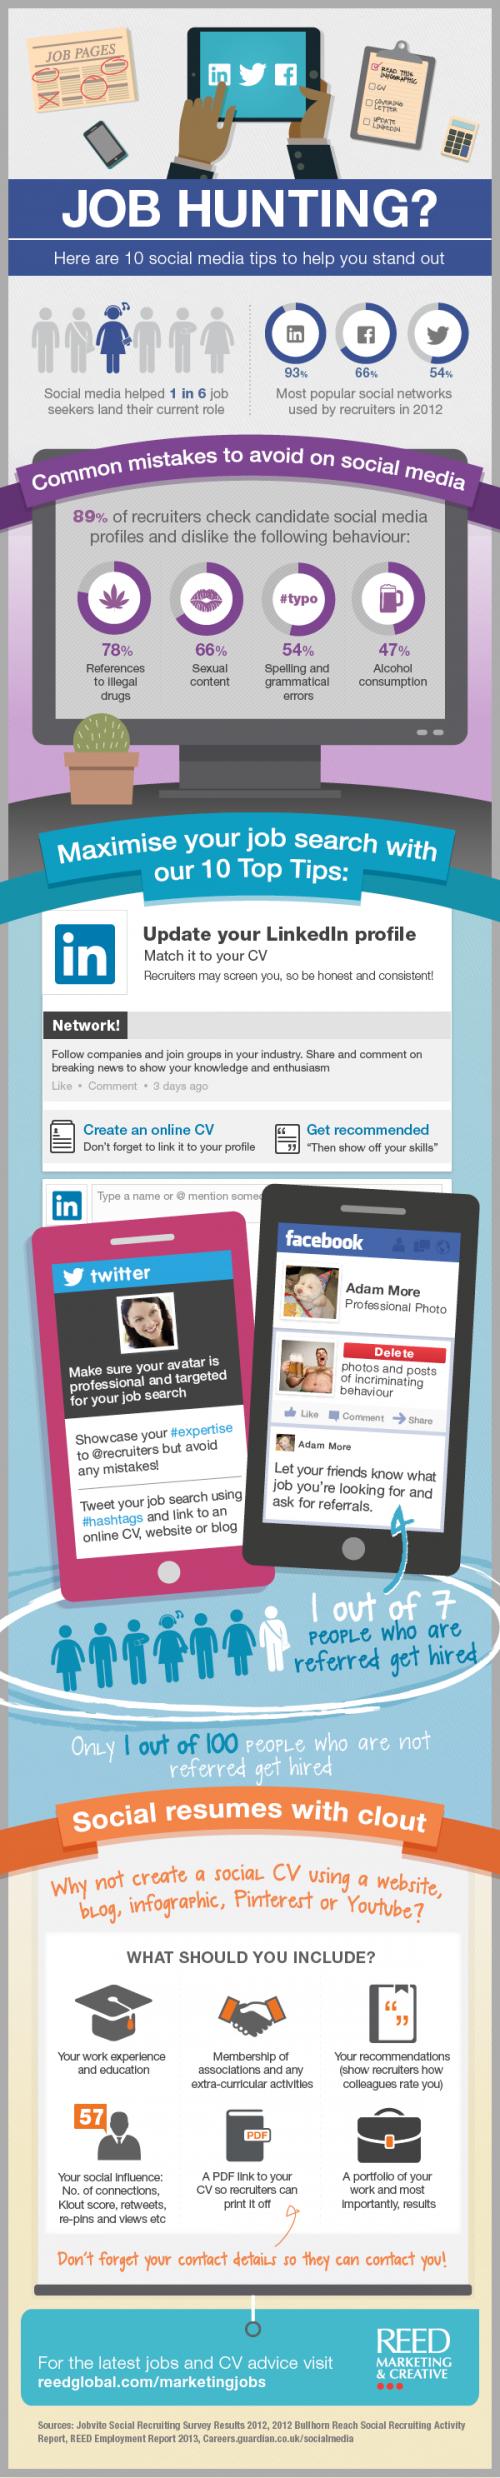 tips for finding a job using social media infographic job hunting social media